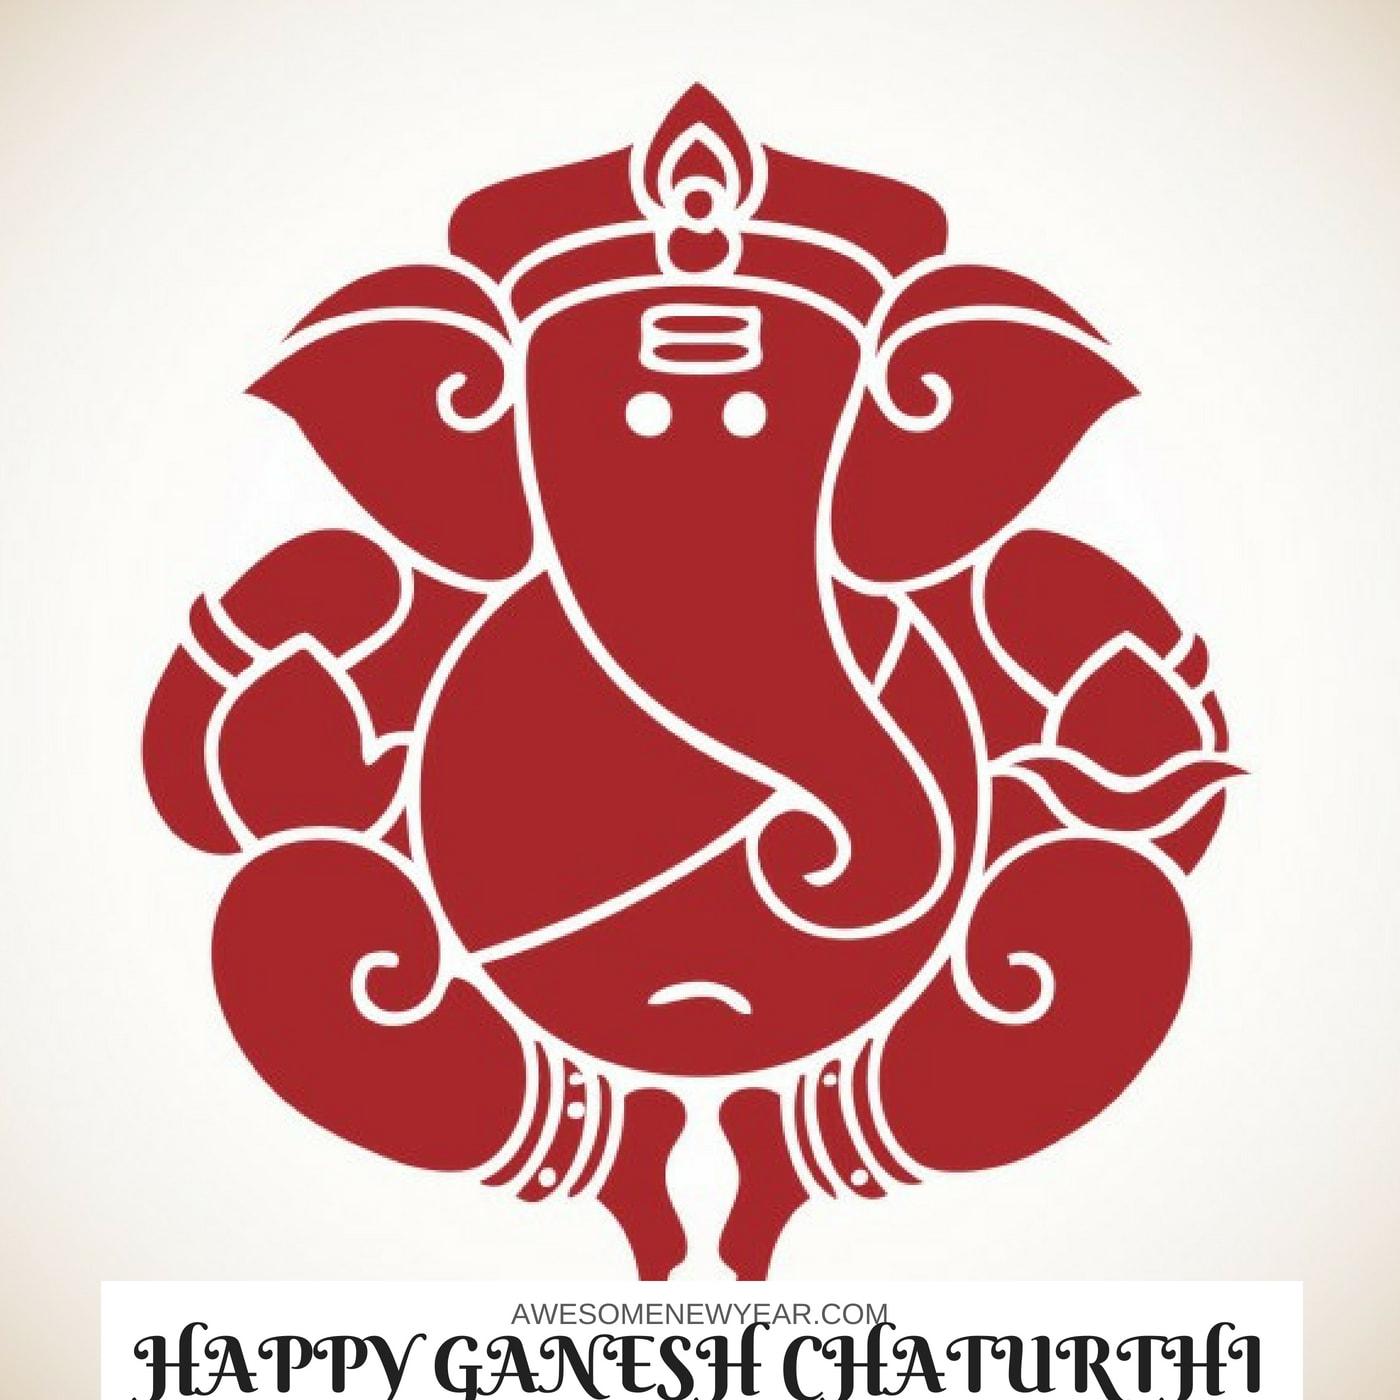 Ganesh Chaturthi Images Wishes Happy Vinayaka Chaturthi 2018